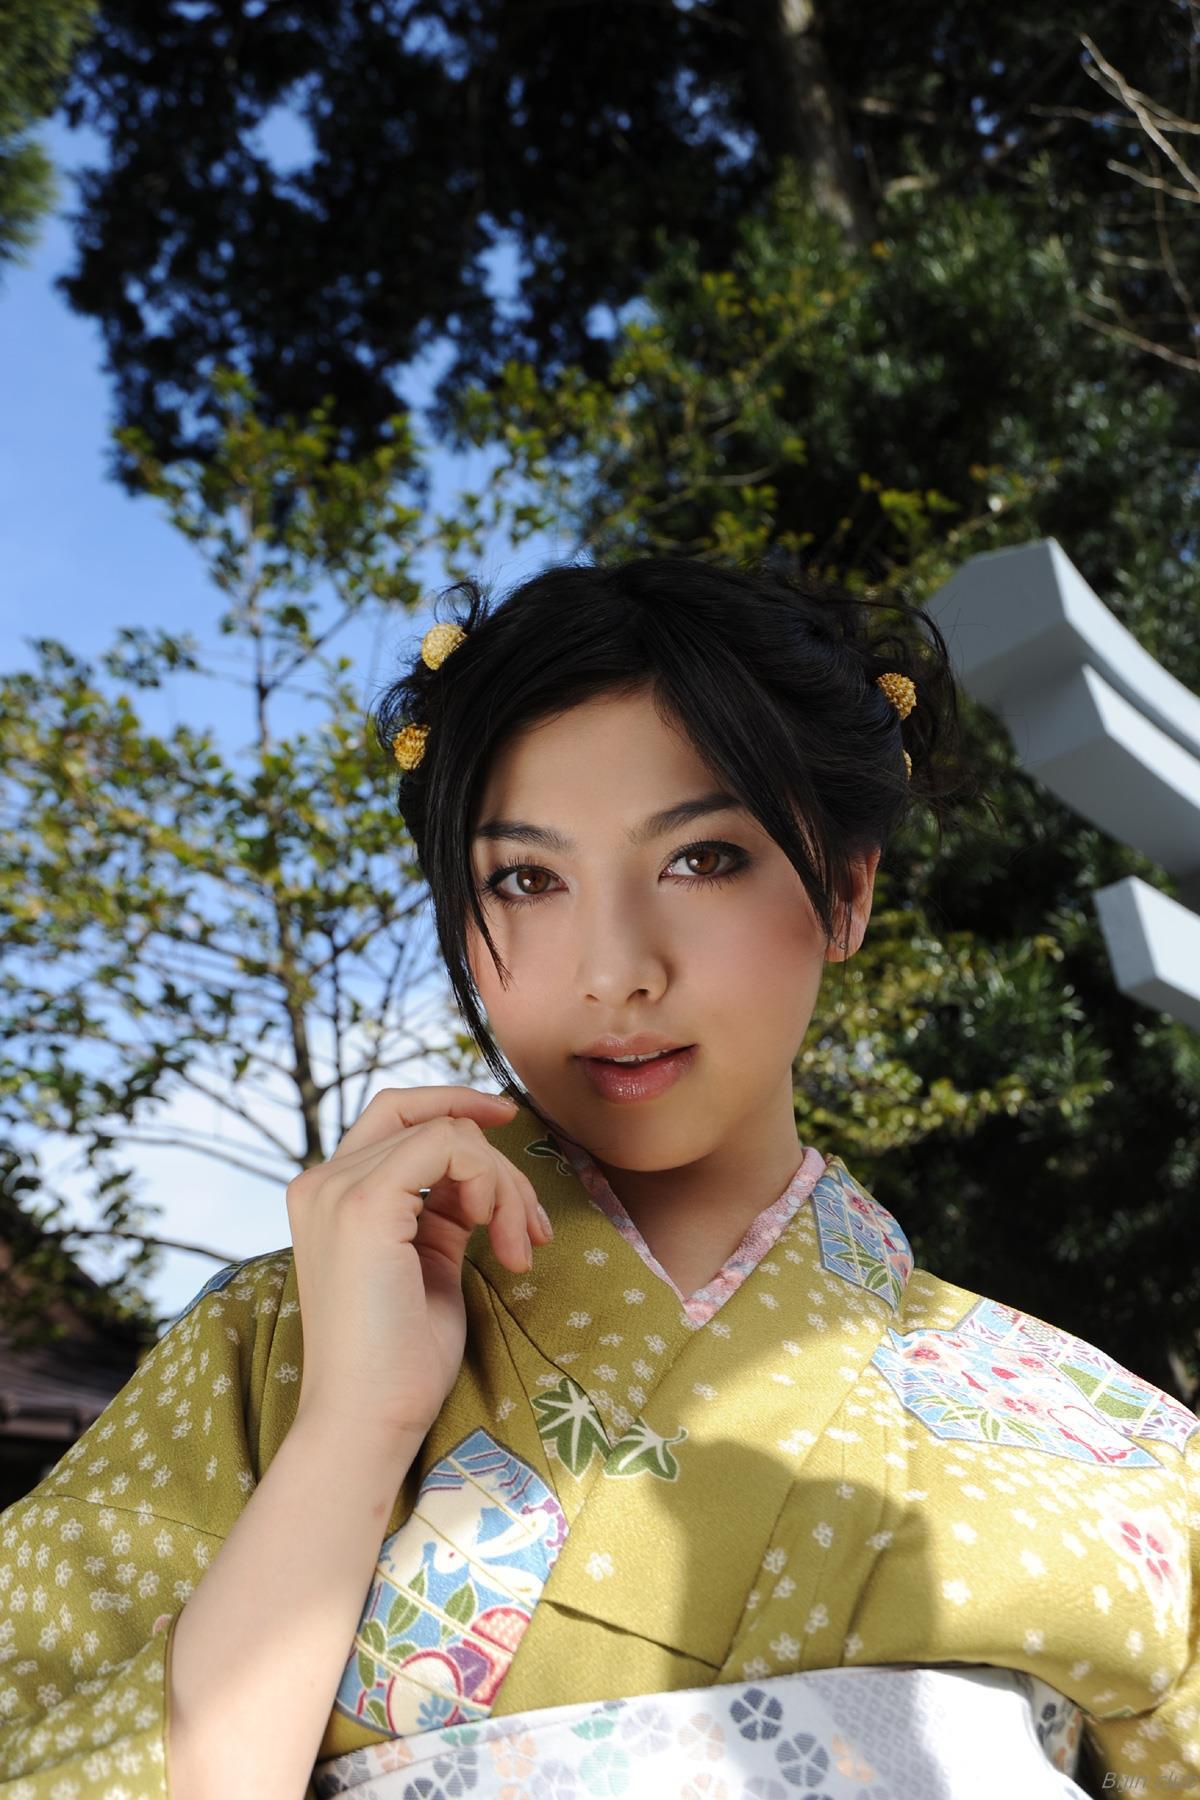 Saori_Hara_20.jpg